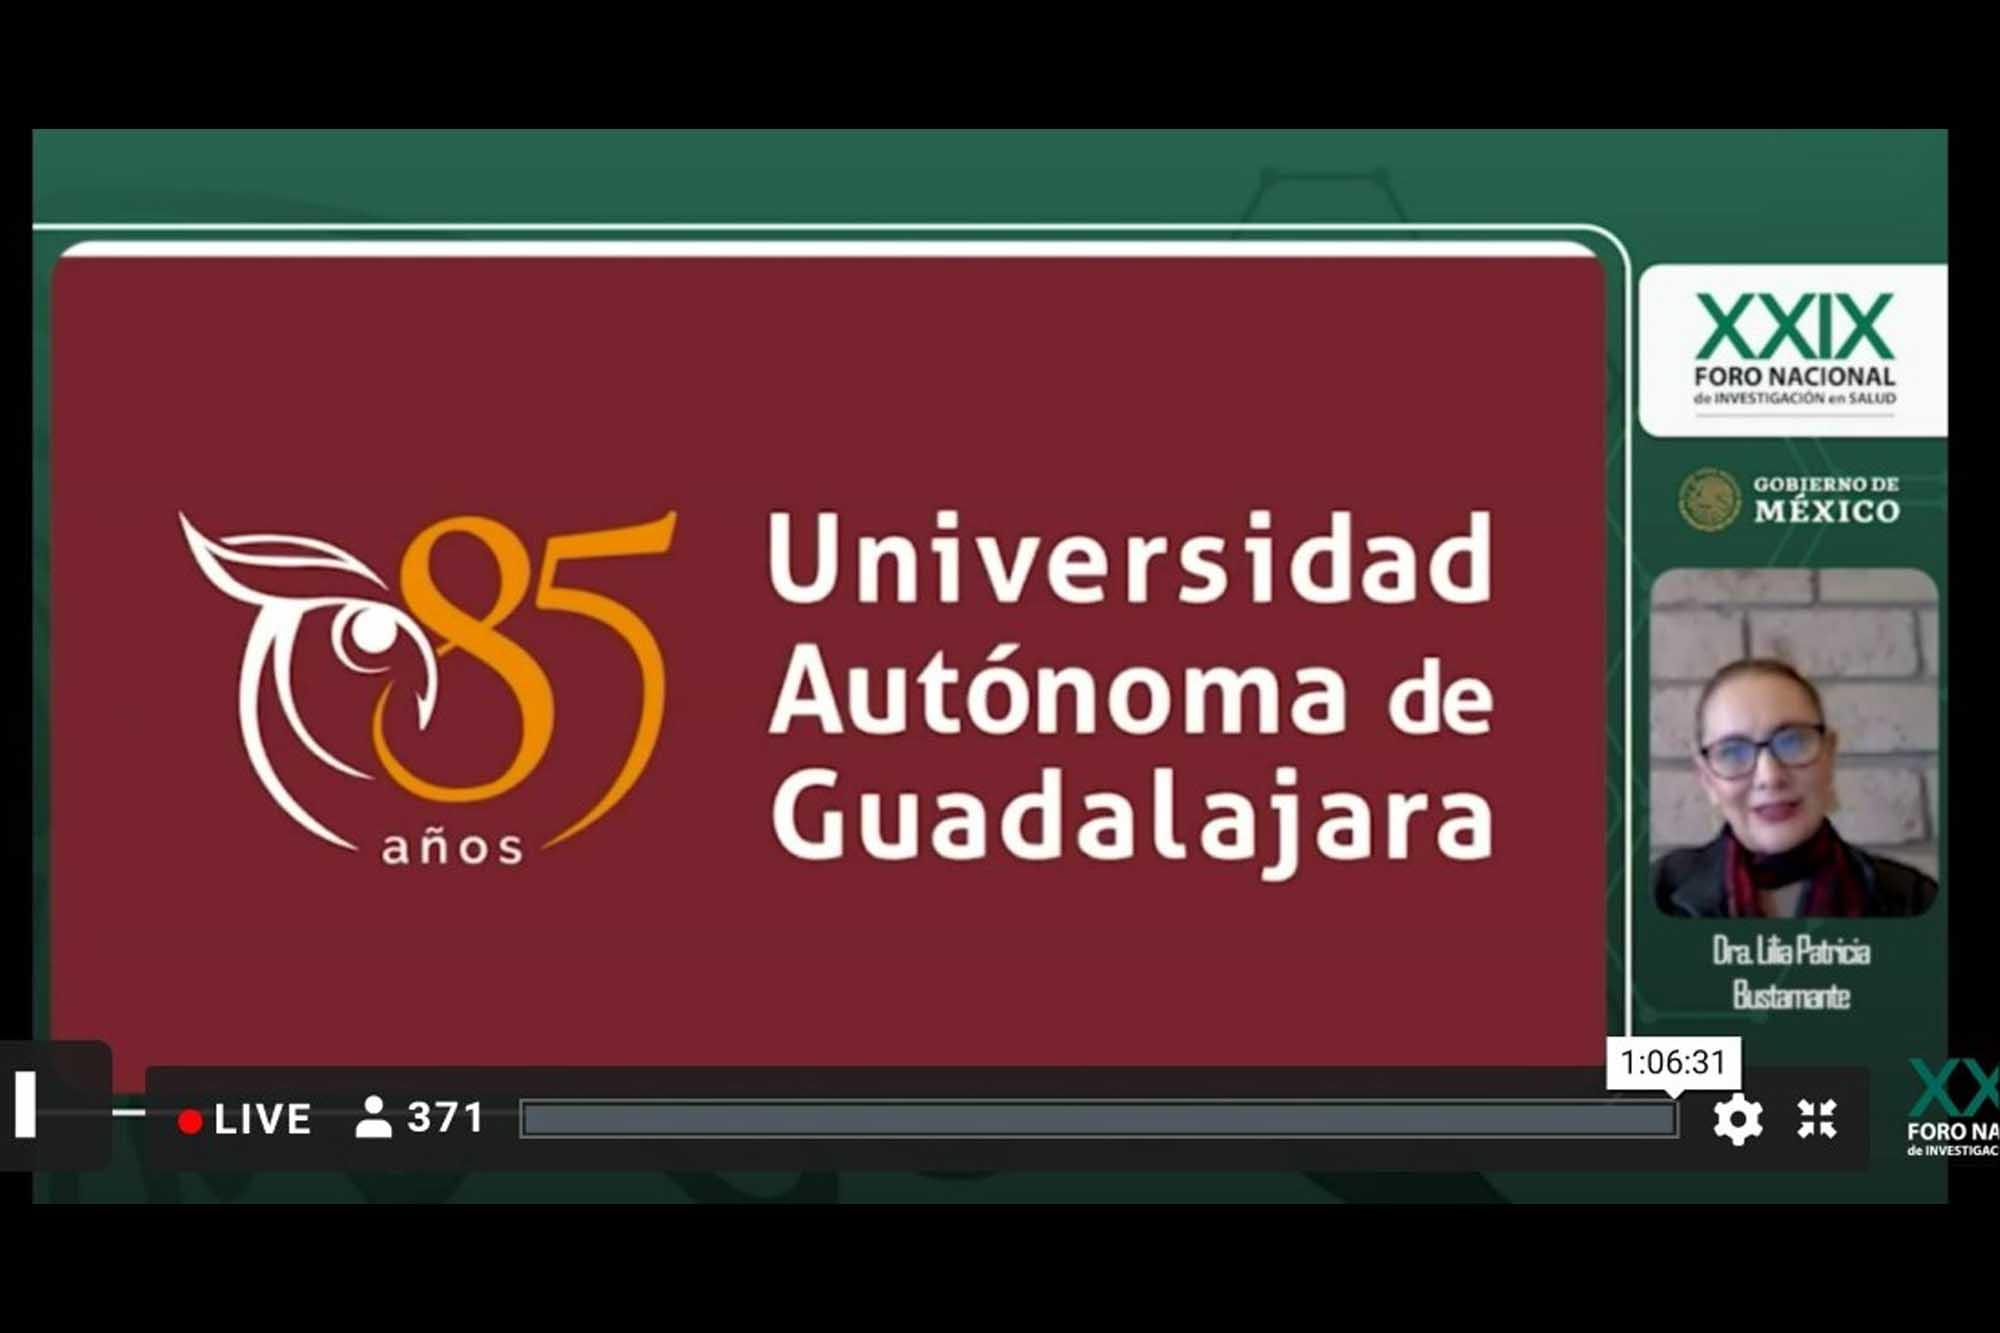 Presentacion Decana 081220